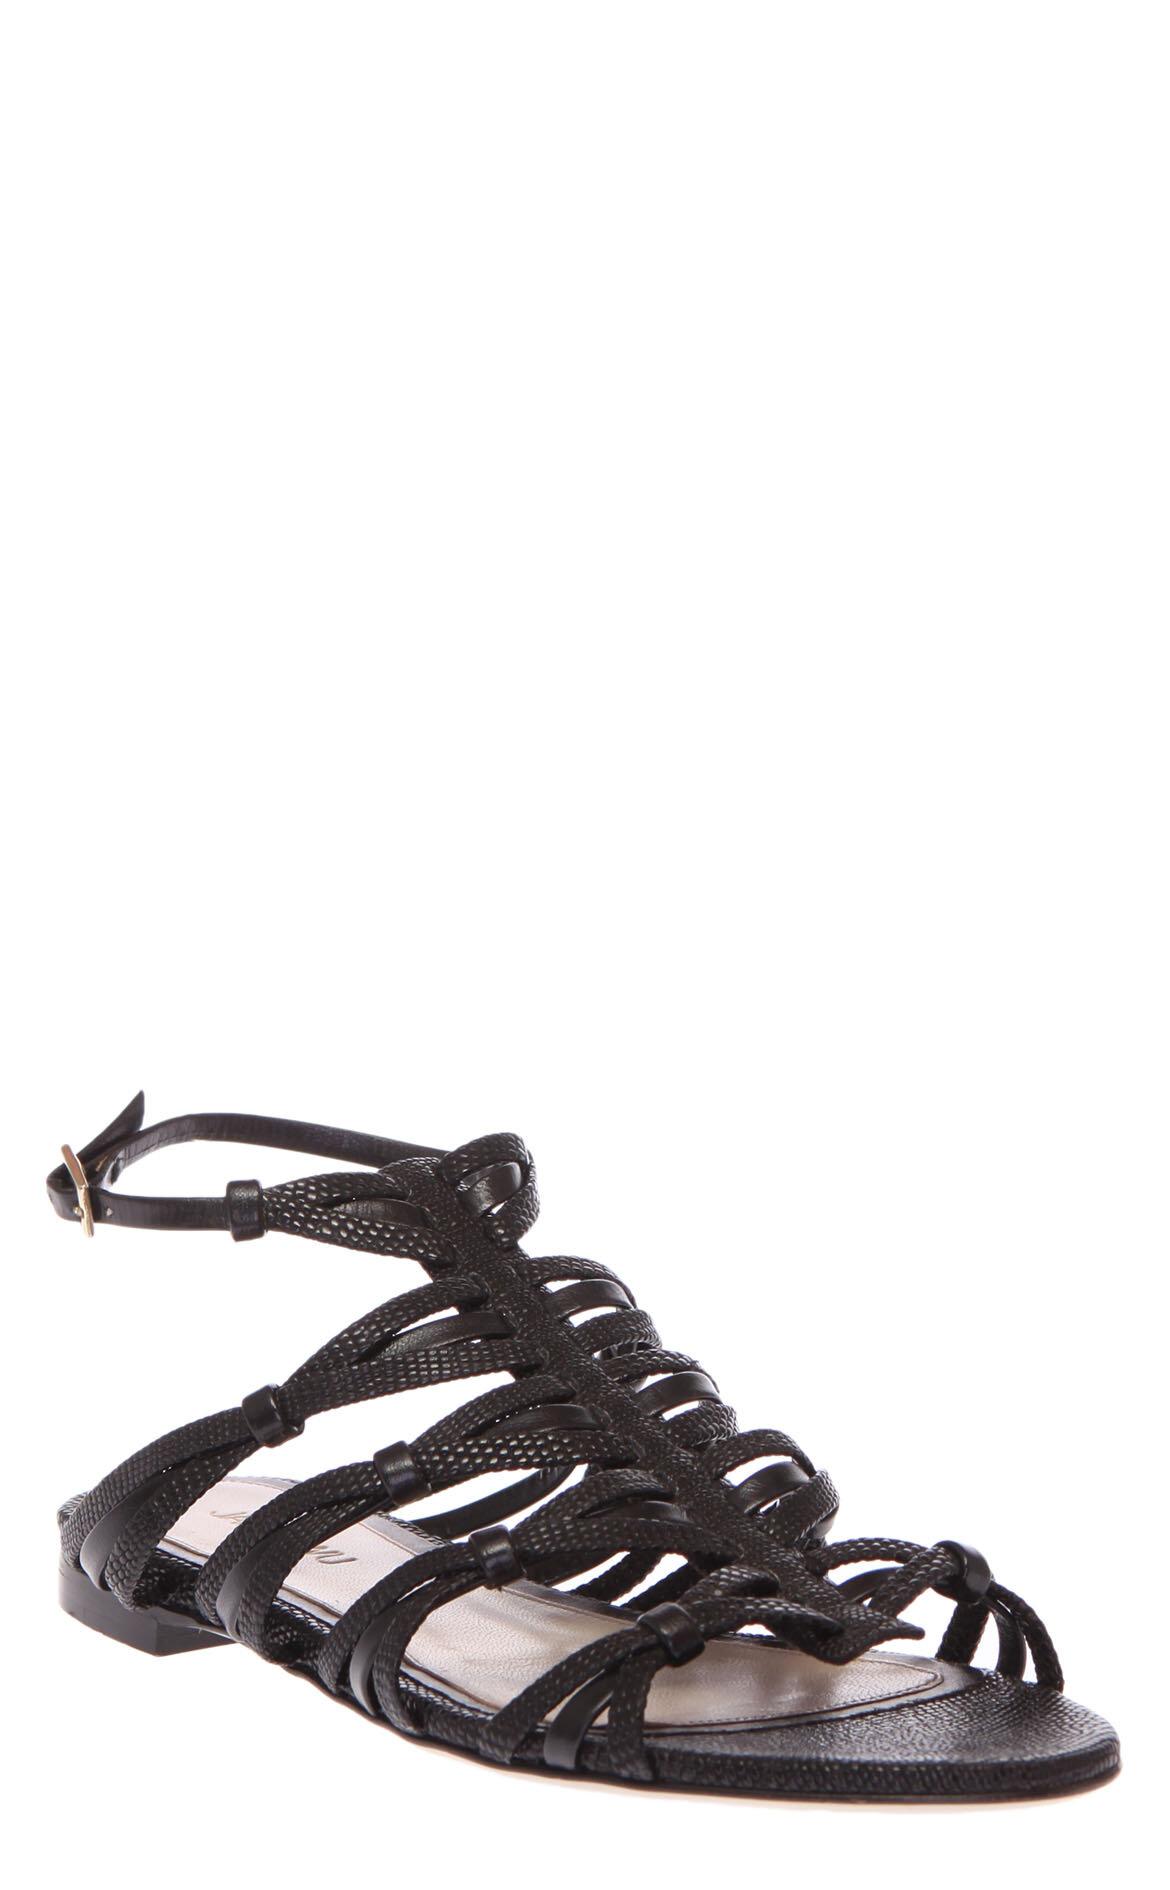 Jason Wu Kadın Siyah Sandalet JWUR14216SE-BLACK - Brandroom